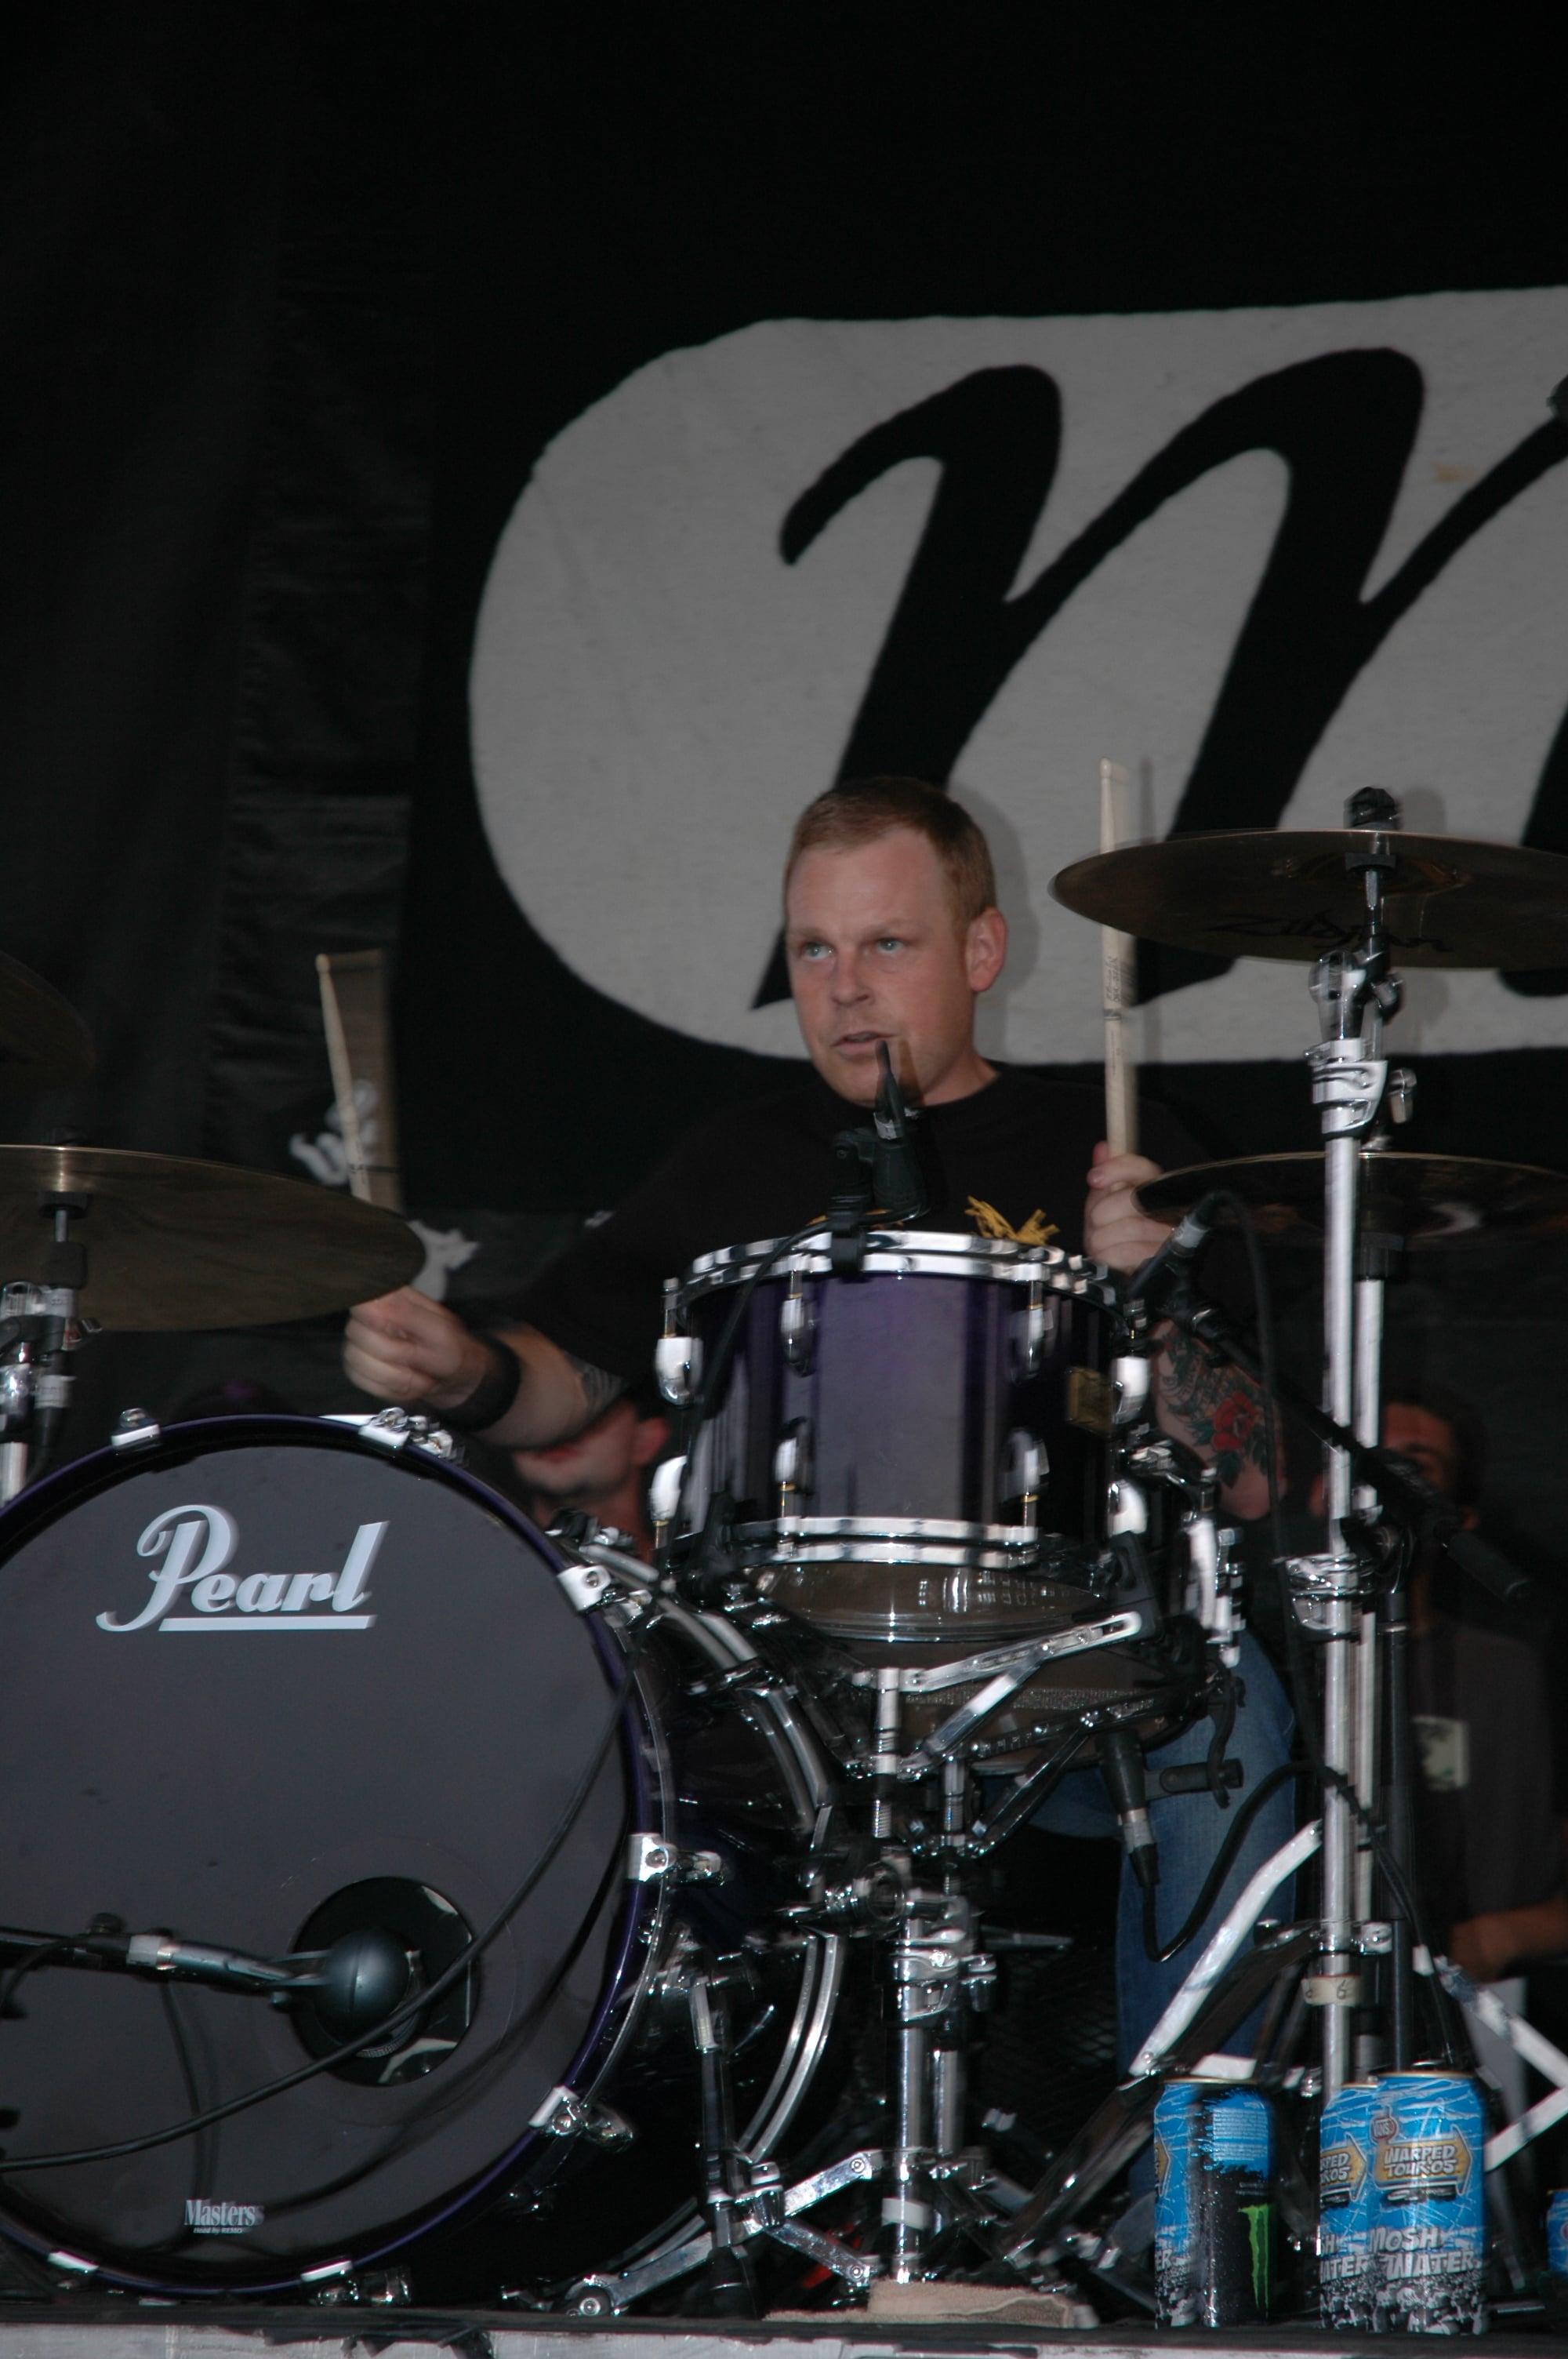 Millencolin @ Warped Tour 05, NYC - 8.12.05 (15)